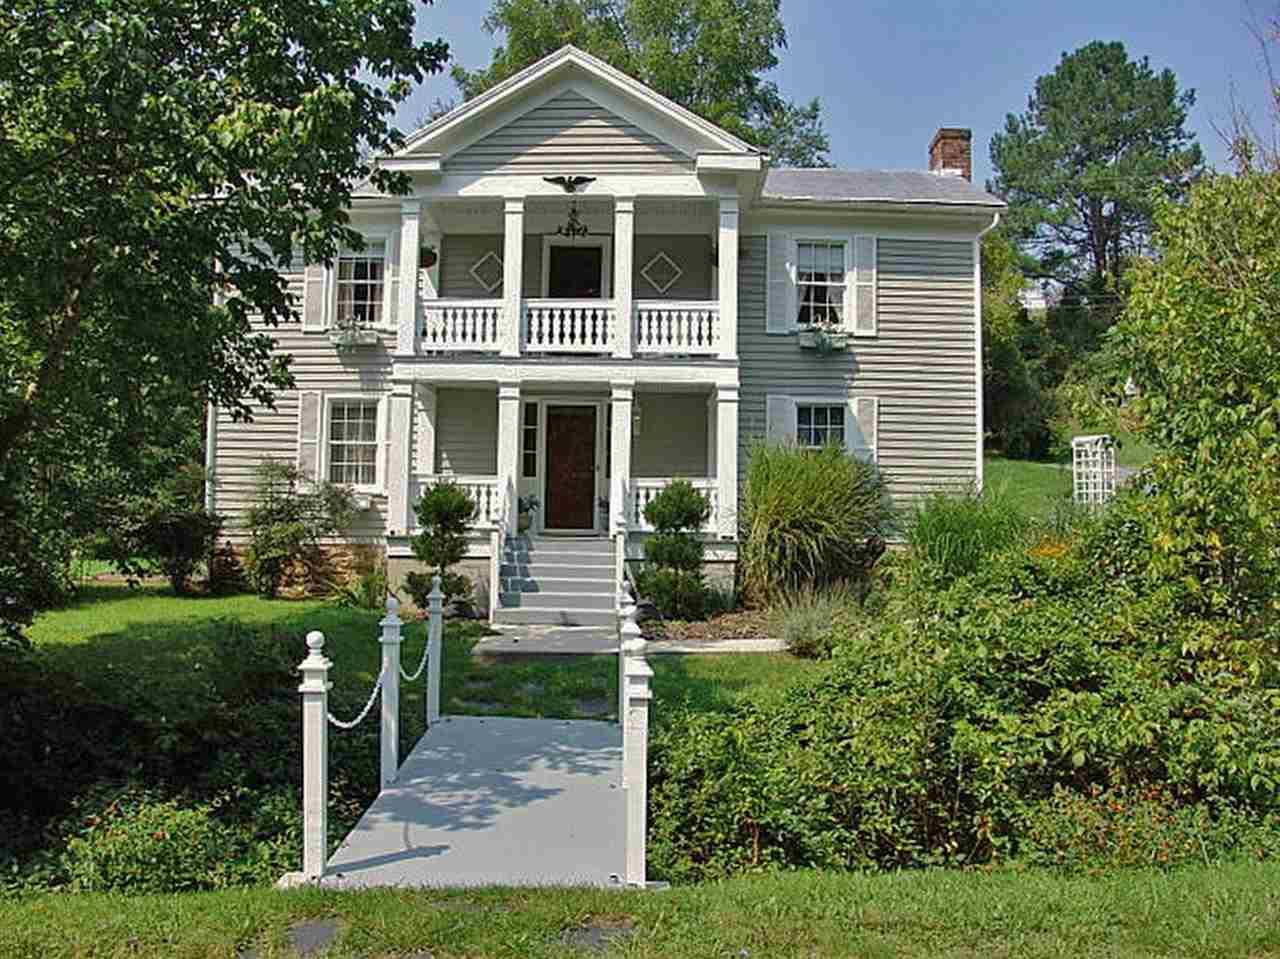 492 GREENHOUSE RD, LEXINGTON, VA 24450